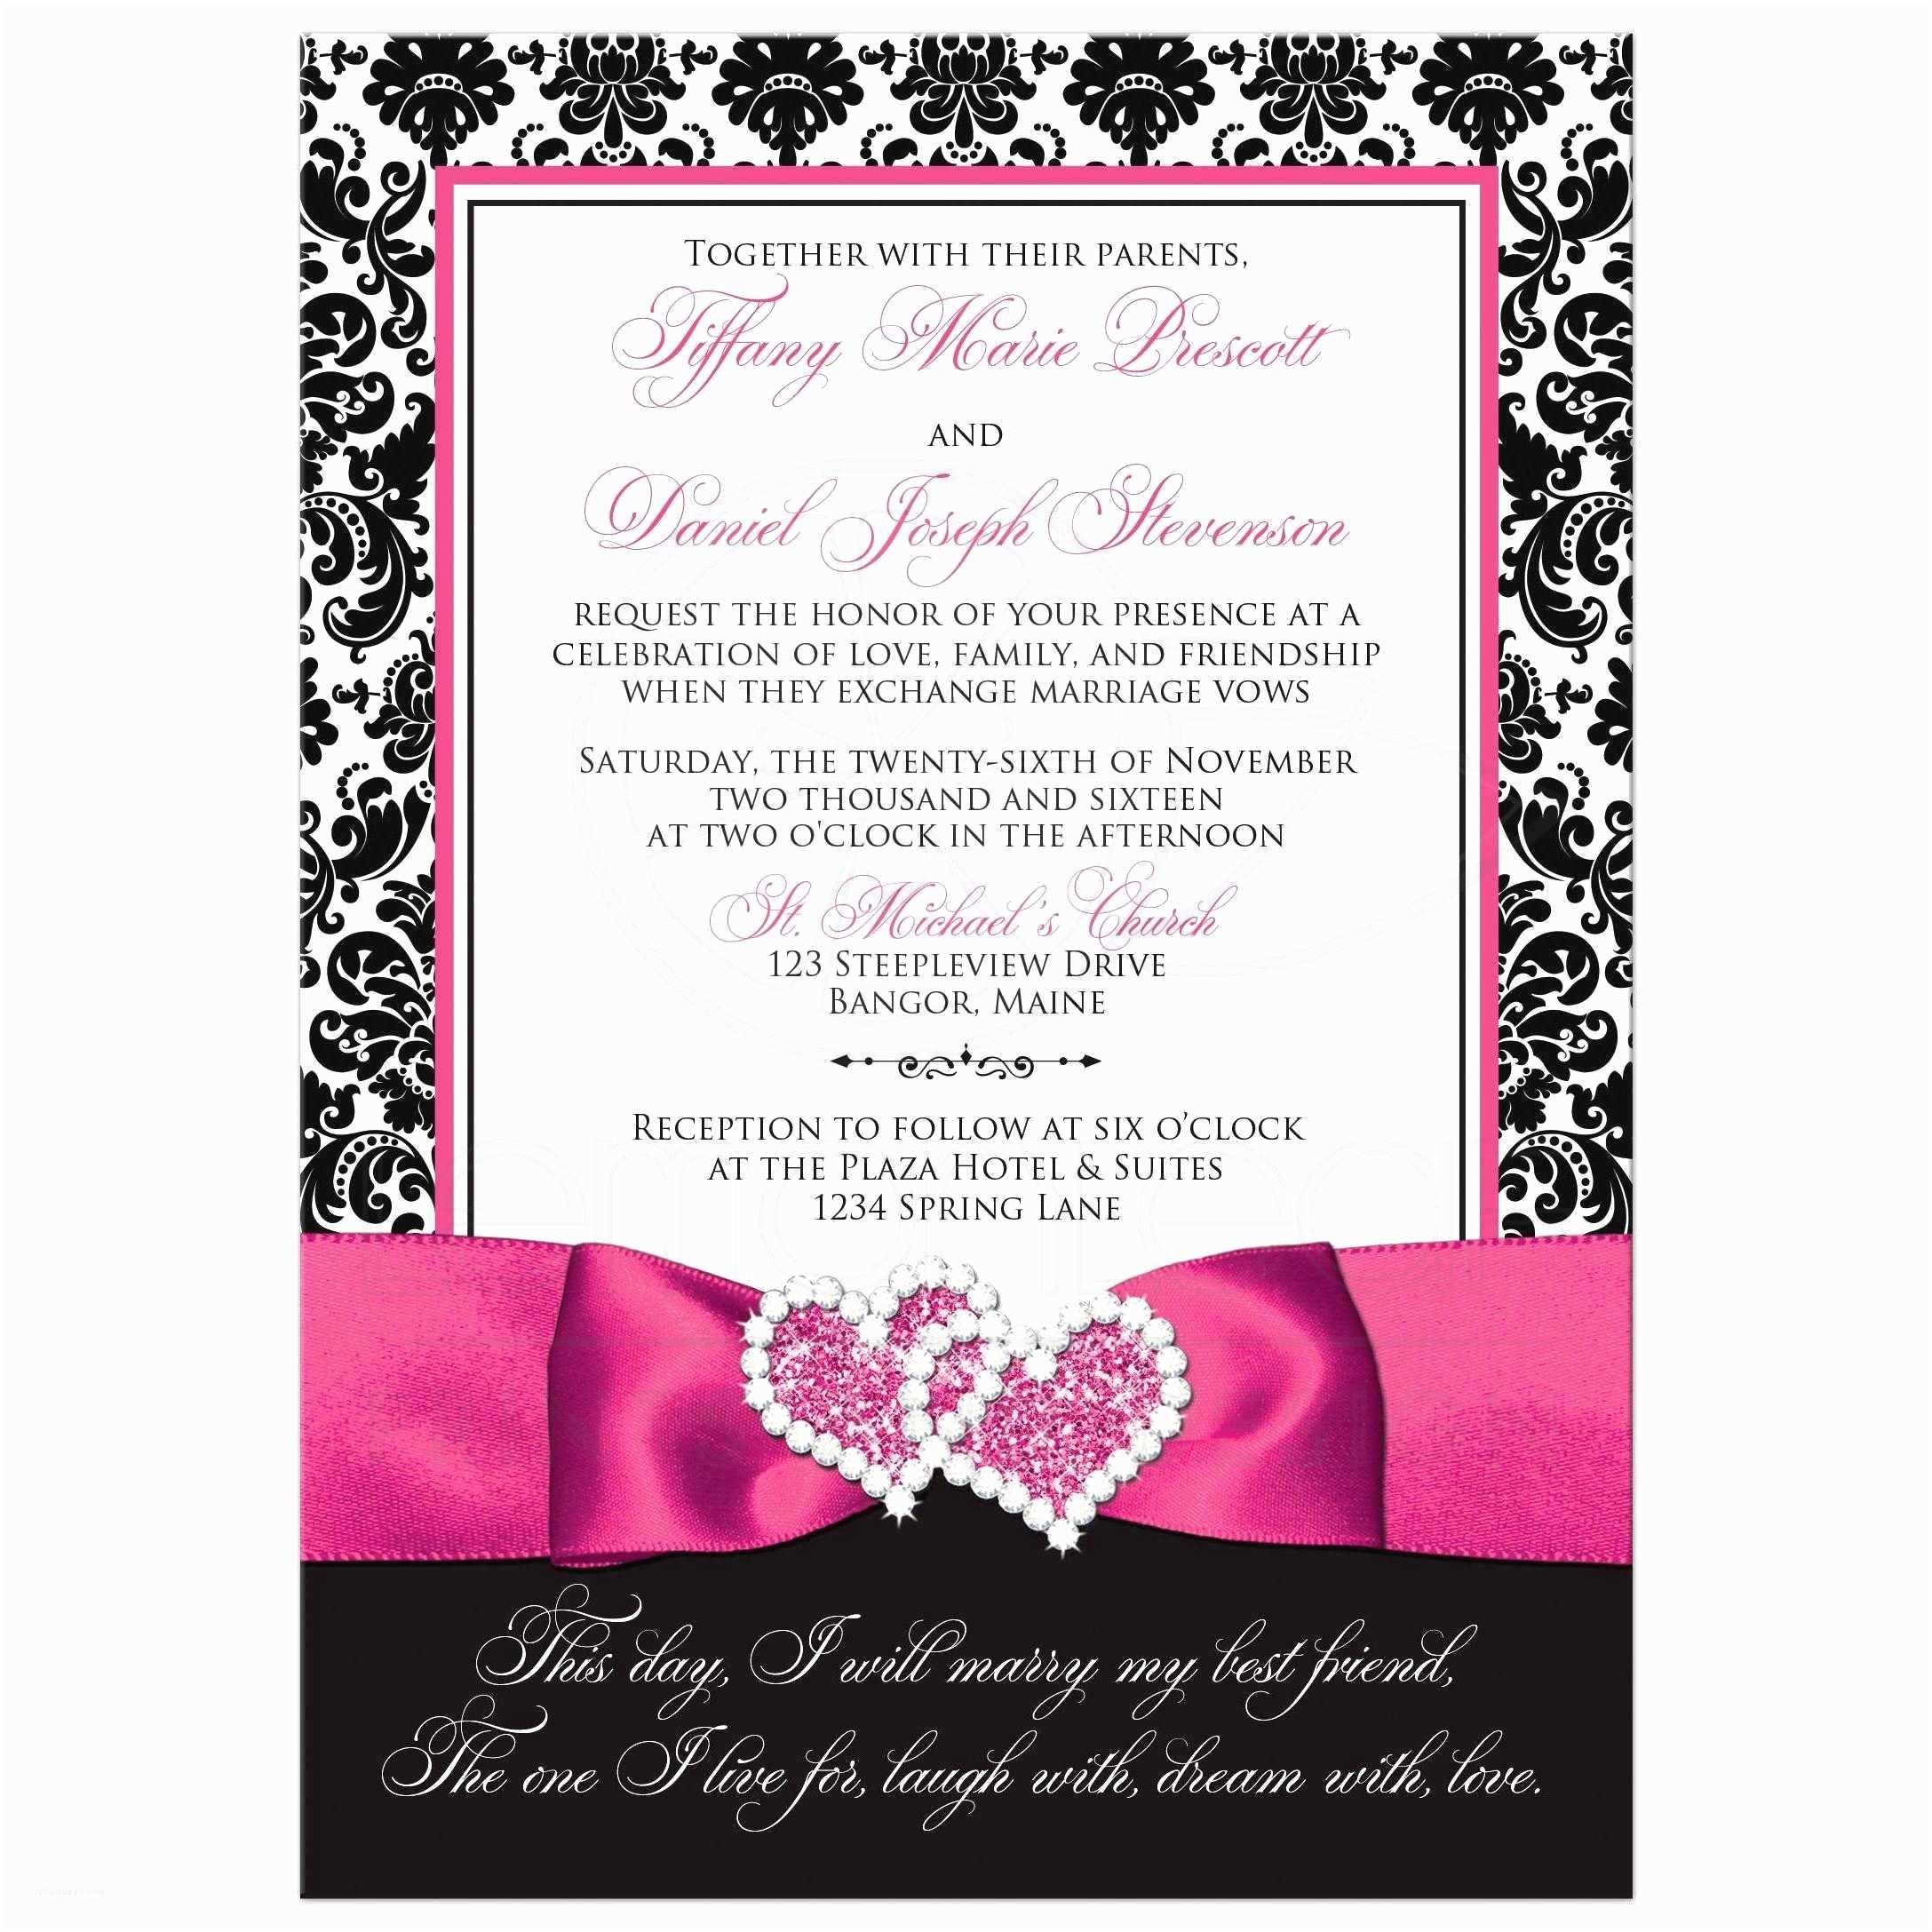 Turquoise And Hot Pink Wedding Invitations Wedding Invitation Photo Optional Black And White Damask Printed Pink